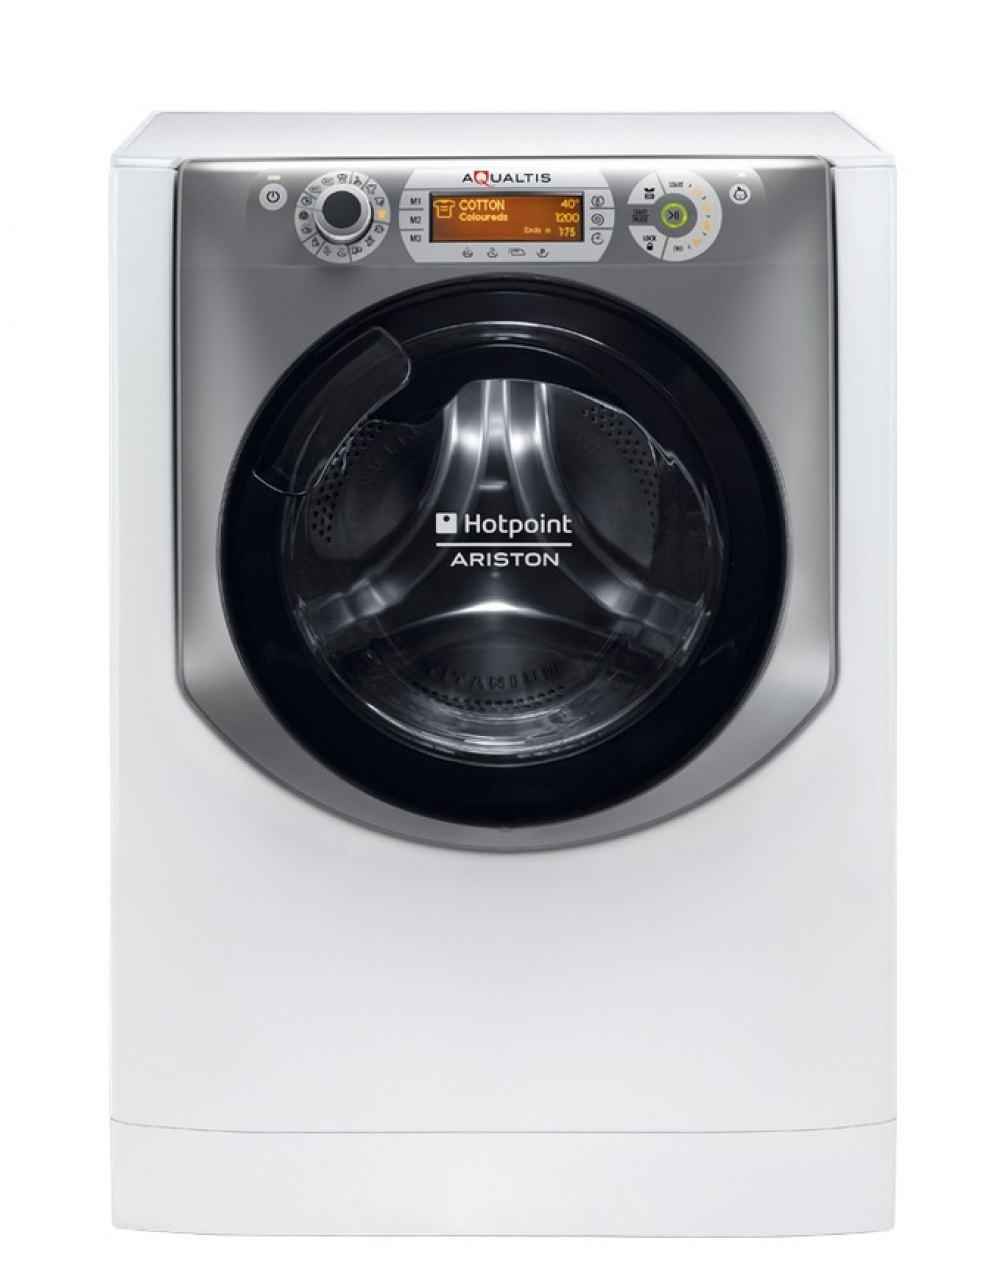 Imagine indisponibila pentru Masina de spalat rufe Hotpoint Ariston Aqualtis AQS73D 29 EU/B Slim 7 kg clasa A+++